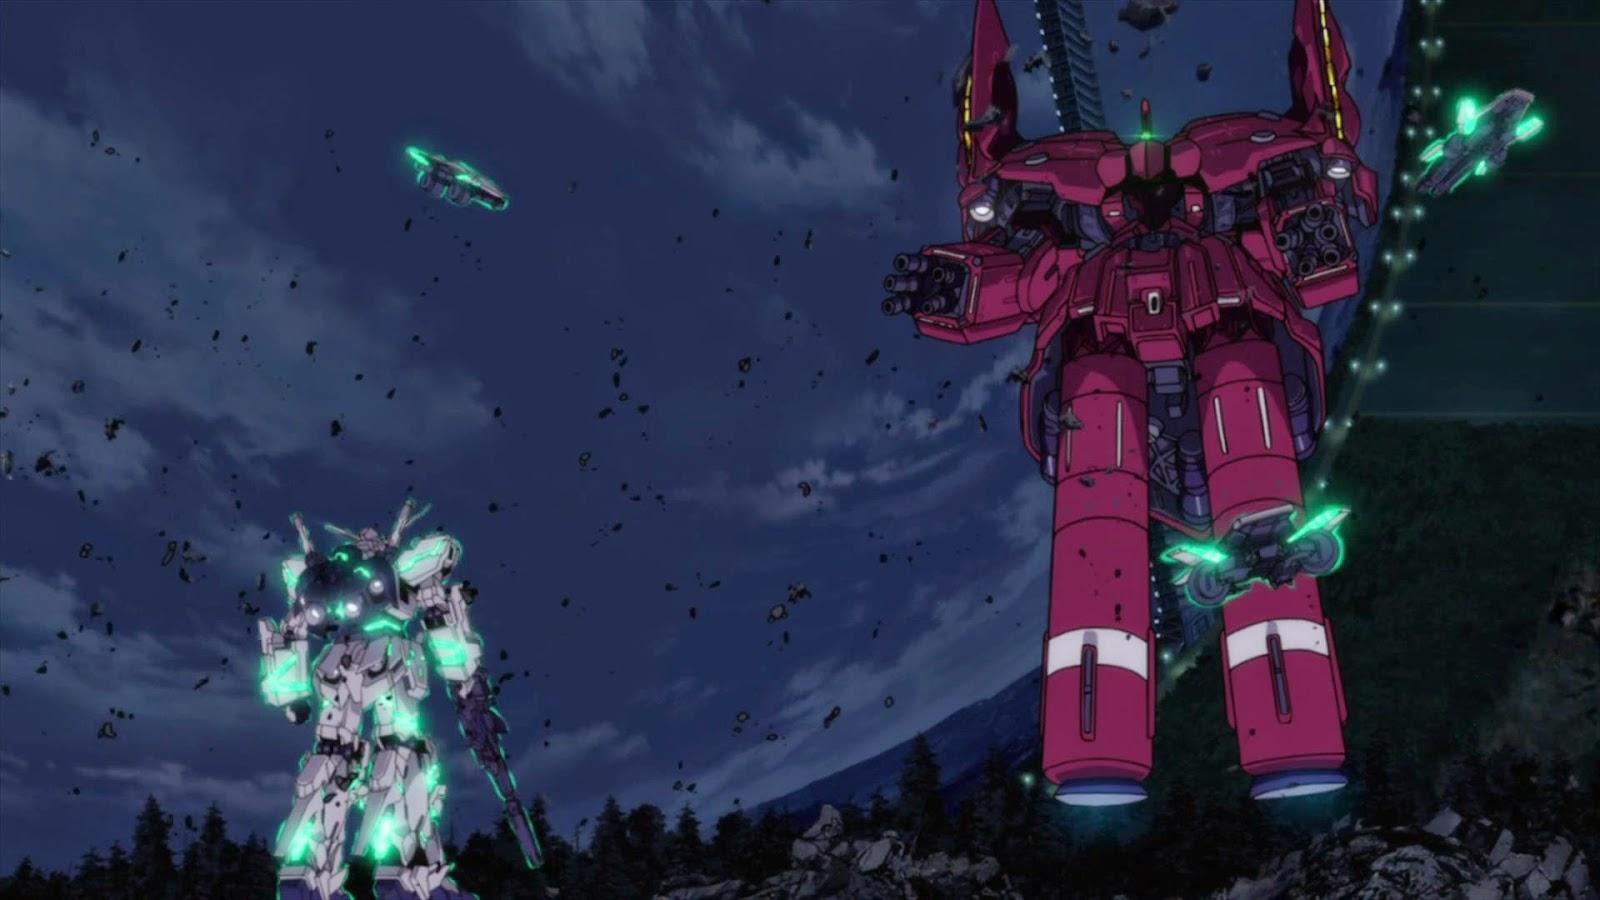 Gundam Unicorn 54 Widescreen Wallpaper - Animewp.com